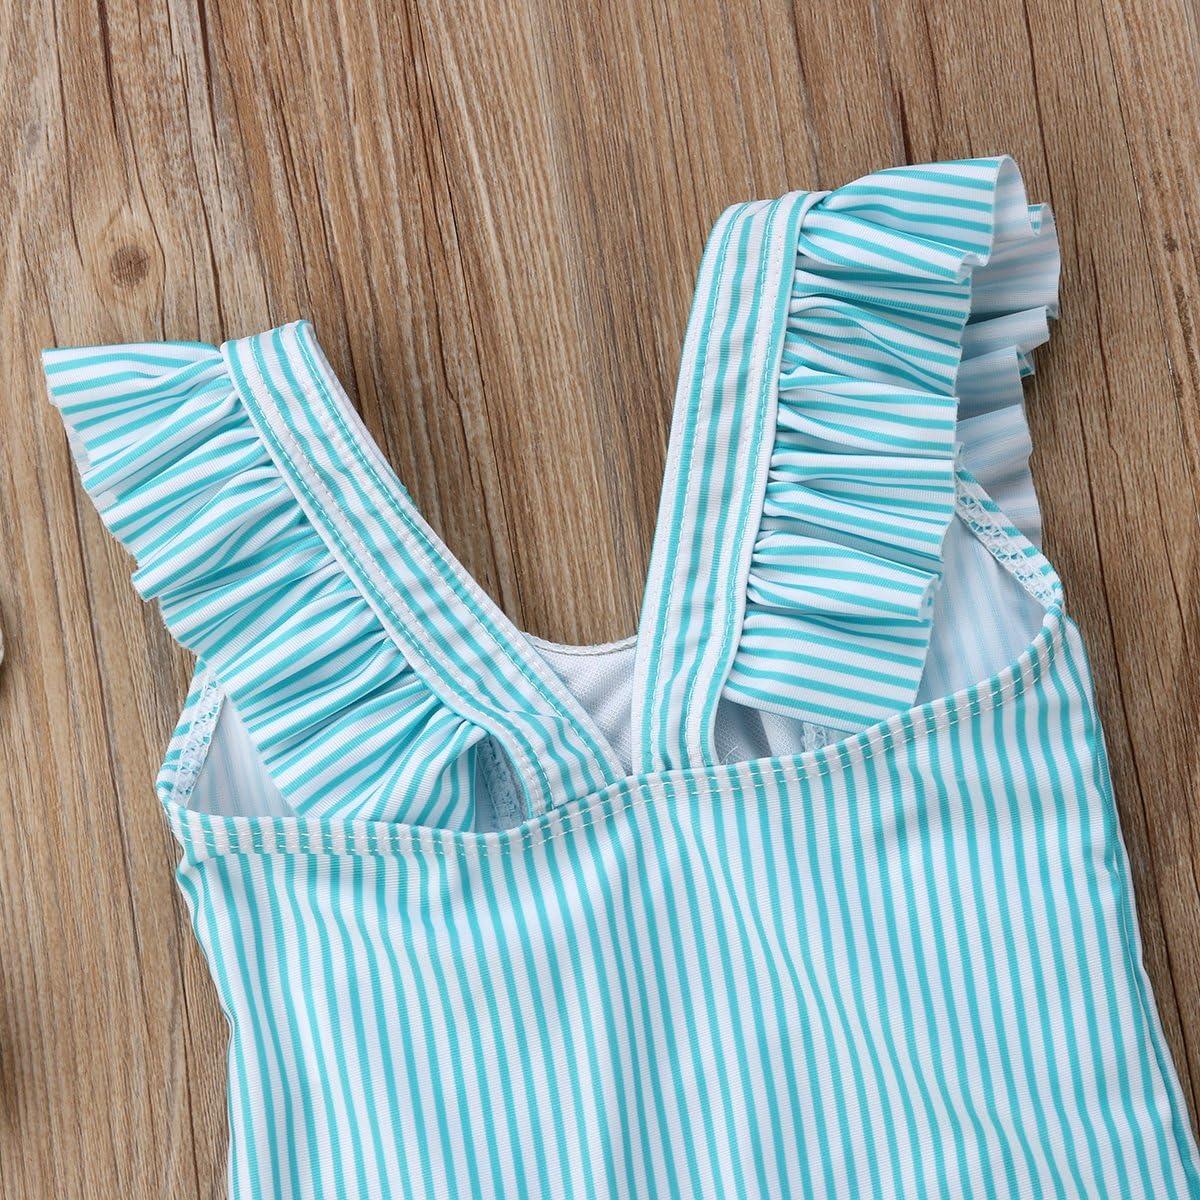 ITFABS Newborn Baby Girl Floral Swimsuit Ruffles Bathing Suit Bikini Striped Swimwear for Baby Girls Beach Wear